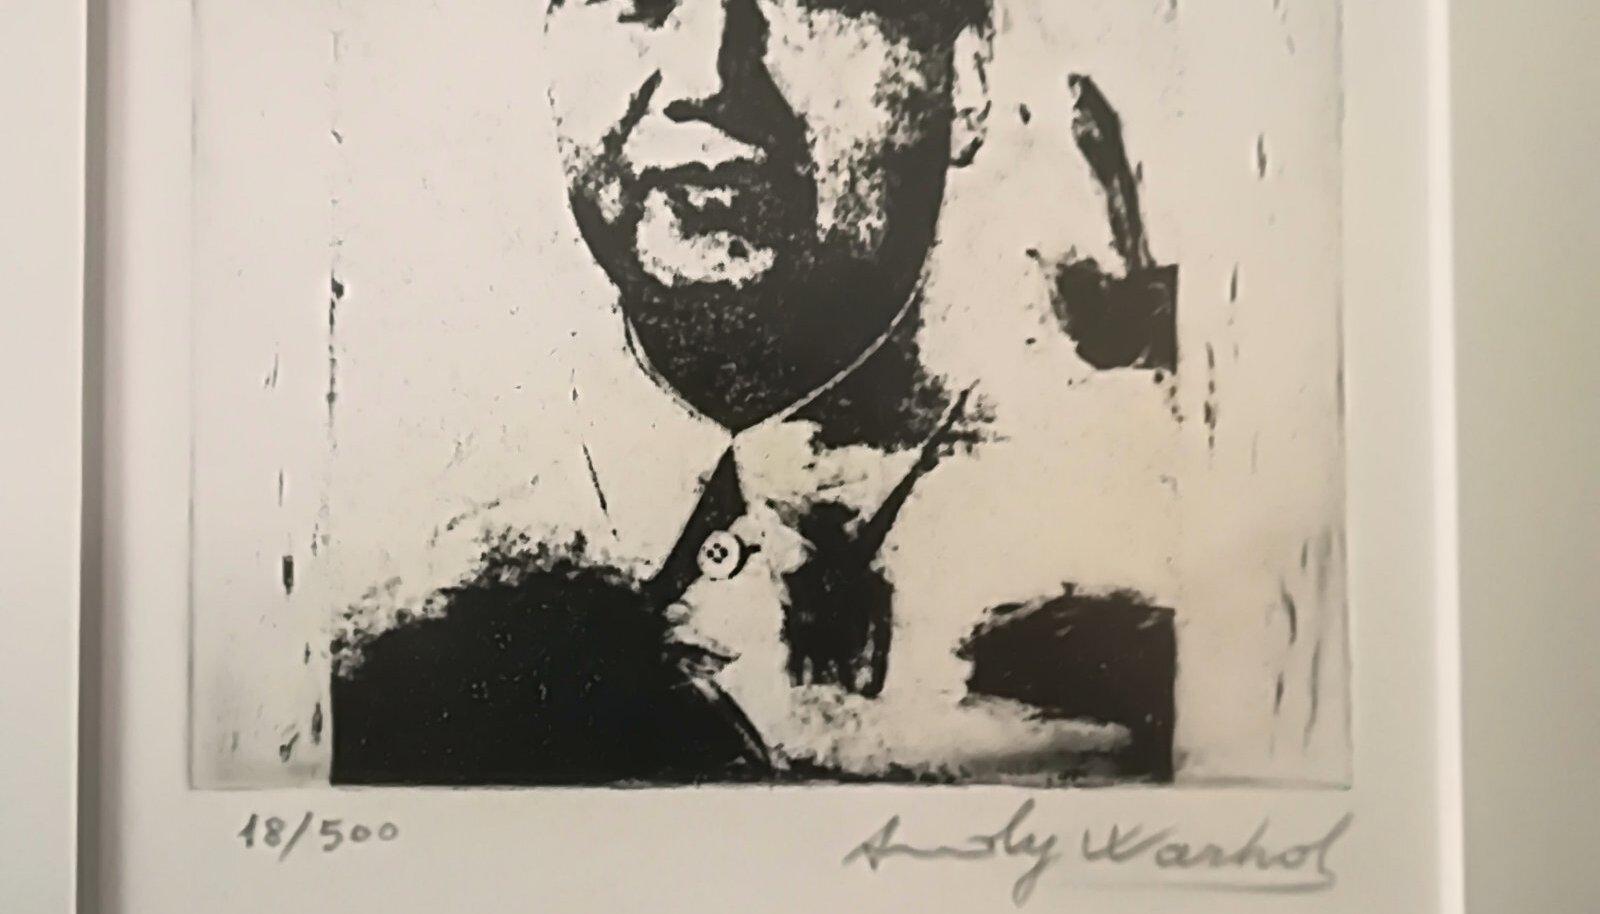 Andy Warholi töö Mao Zedongist